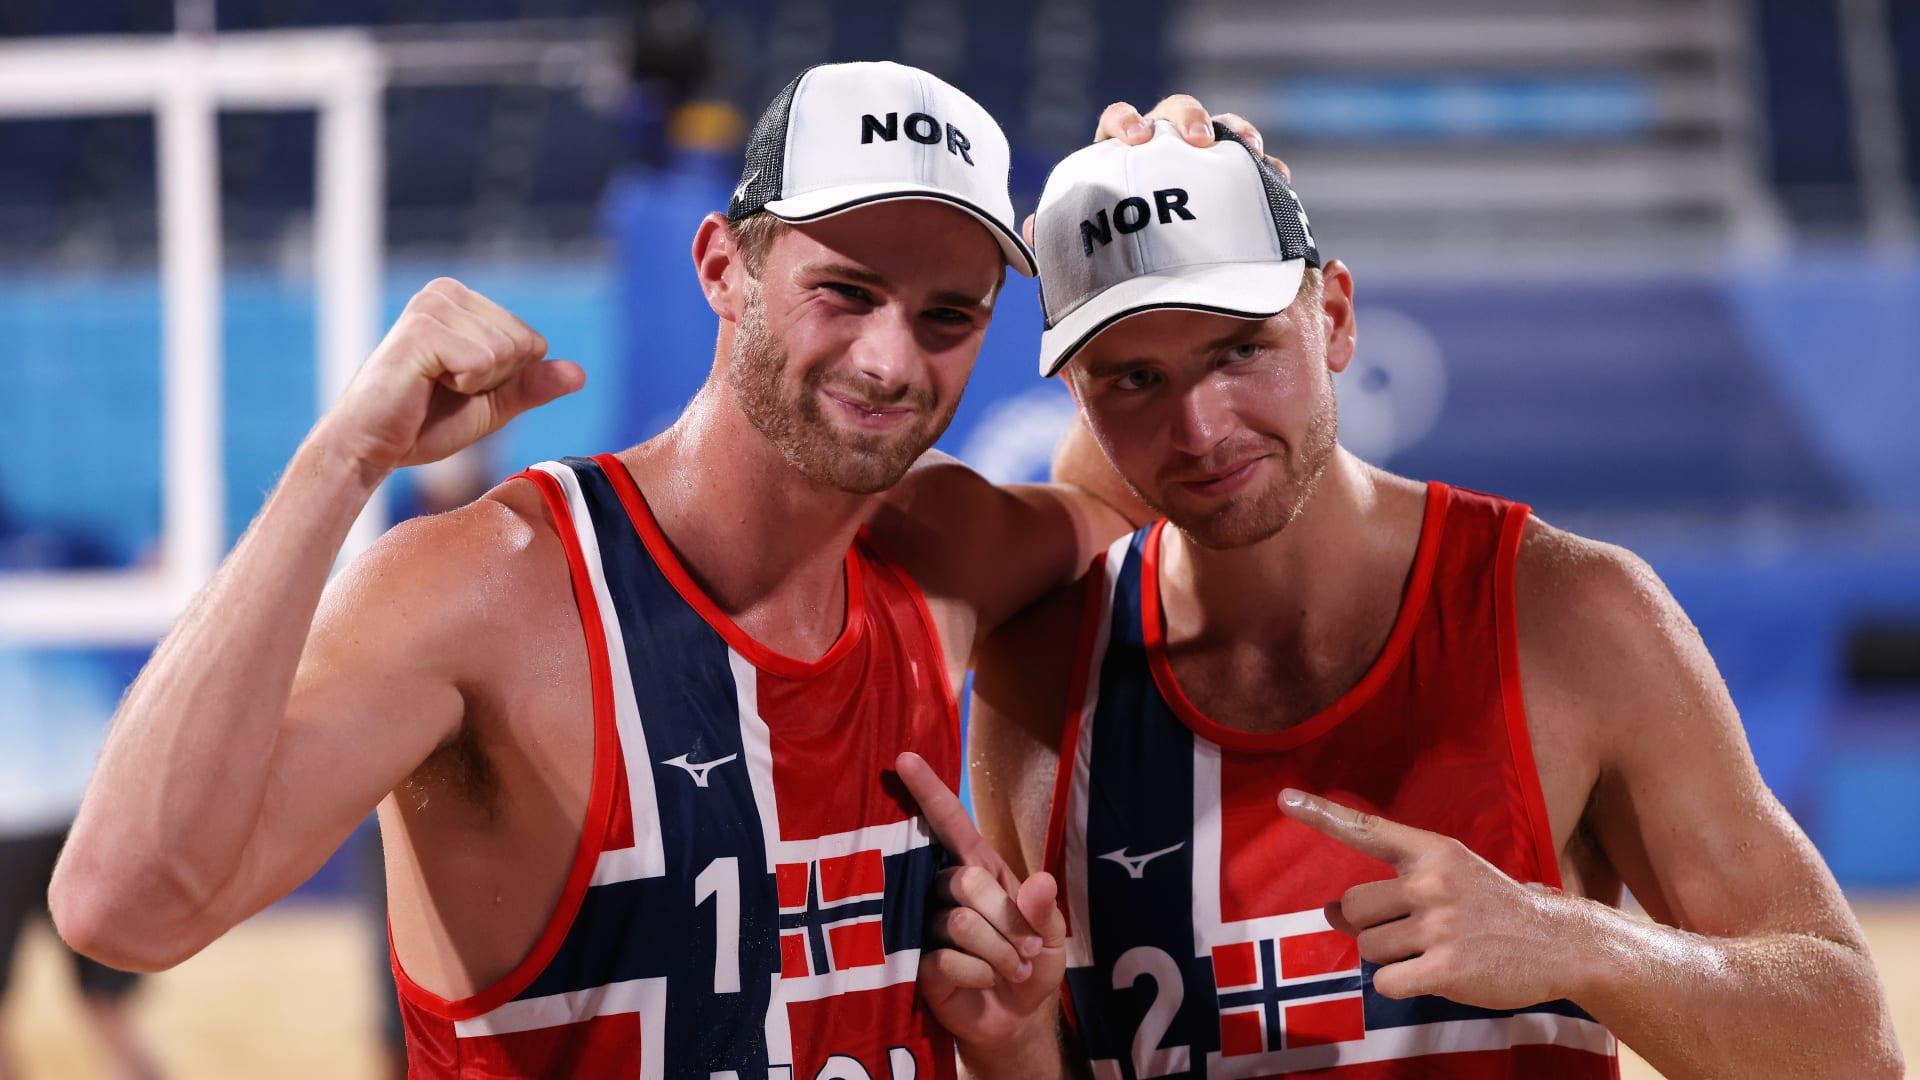 Olympic champs Mol/Sørum retain European crown